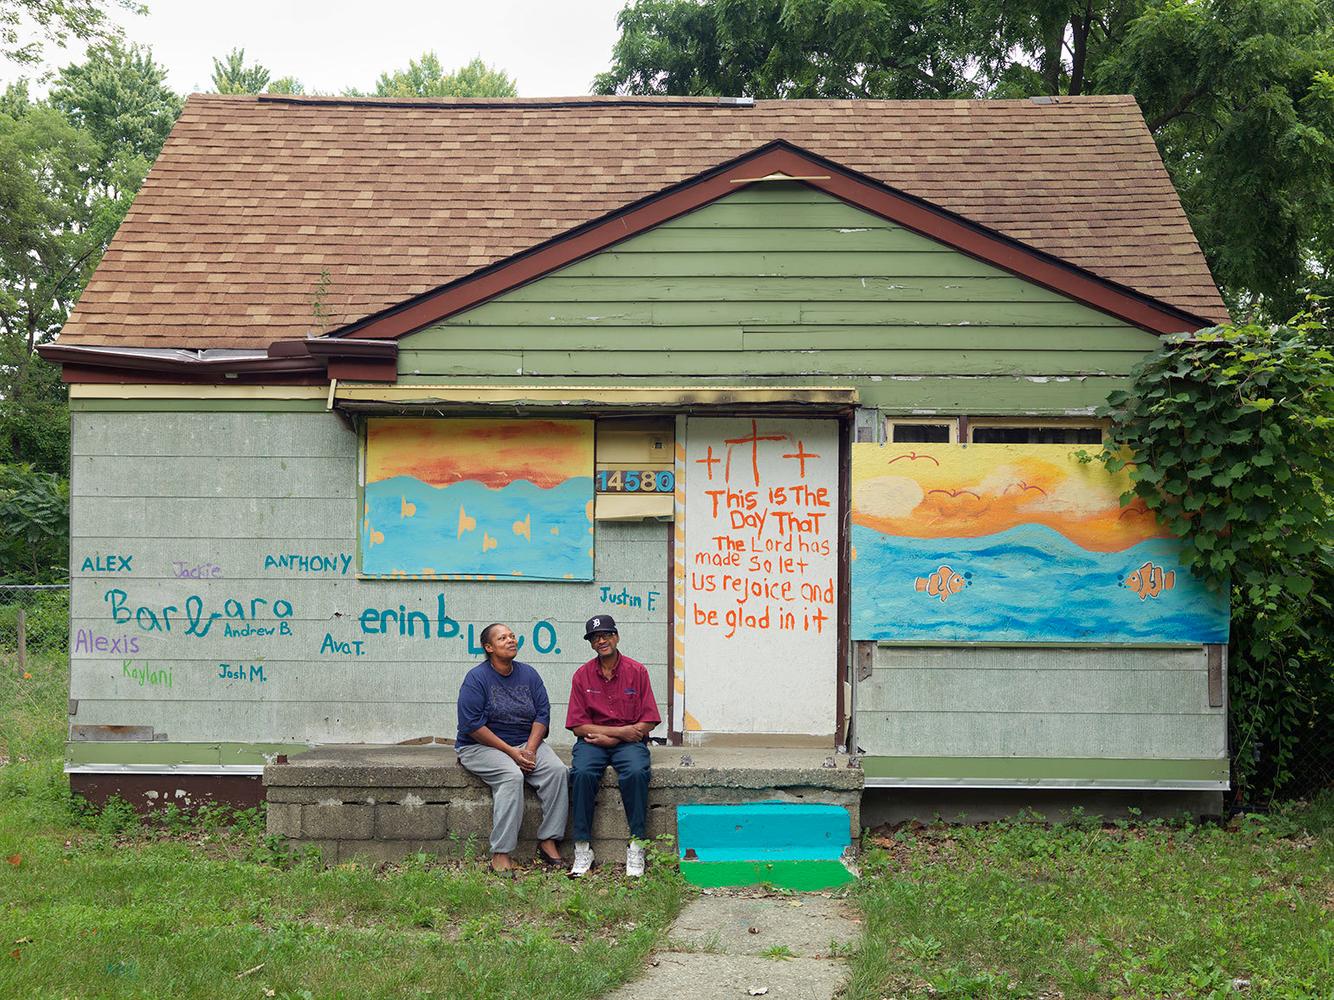 Jackie and Donny, Brightmoor Neighborhood, Detroit 2013